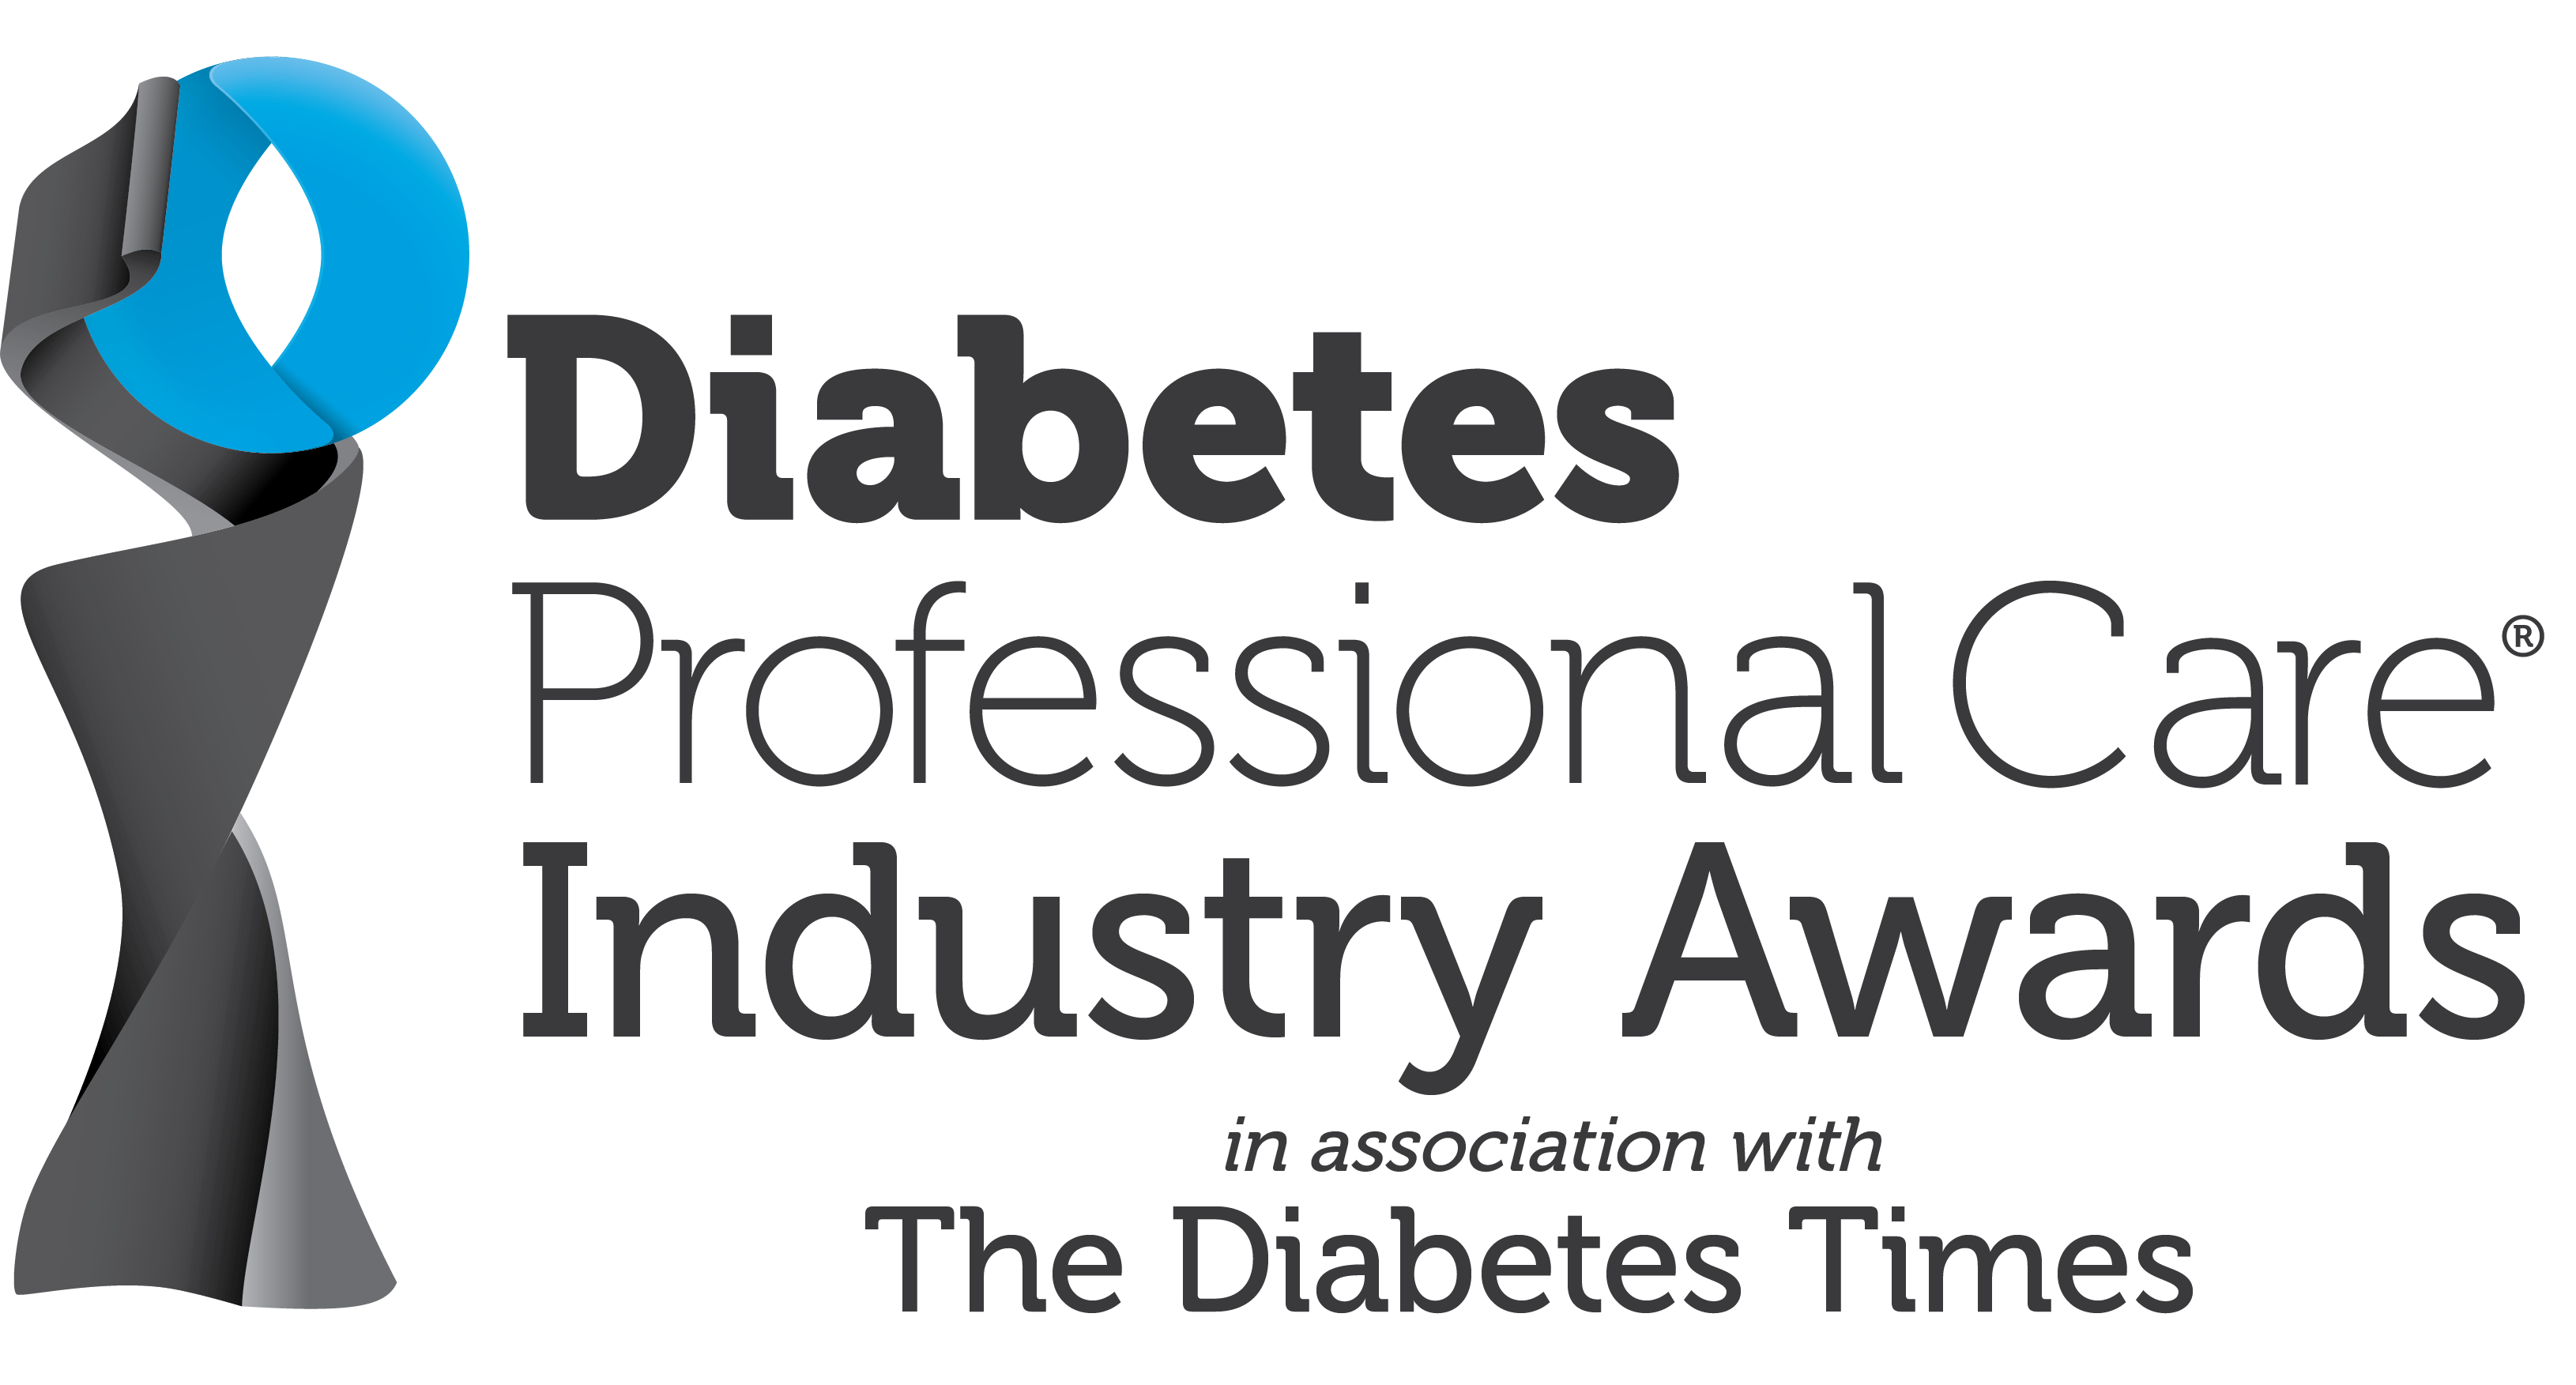 Diabetes Professional Care Awards